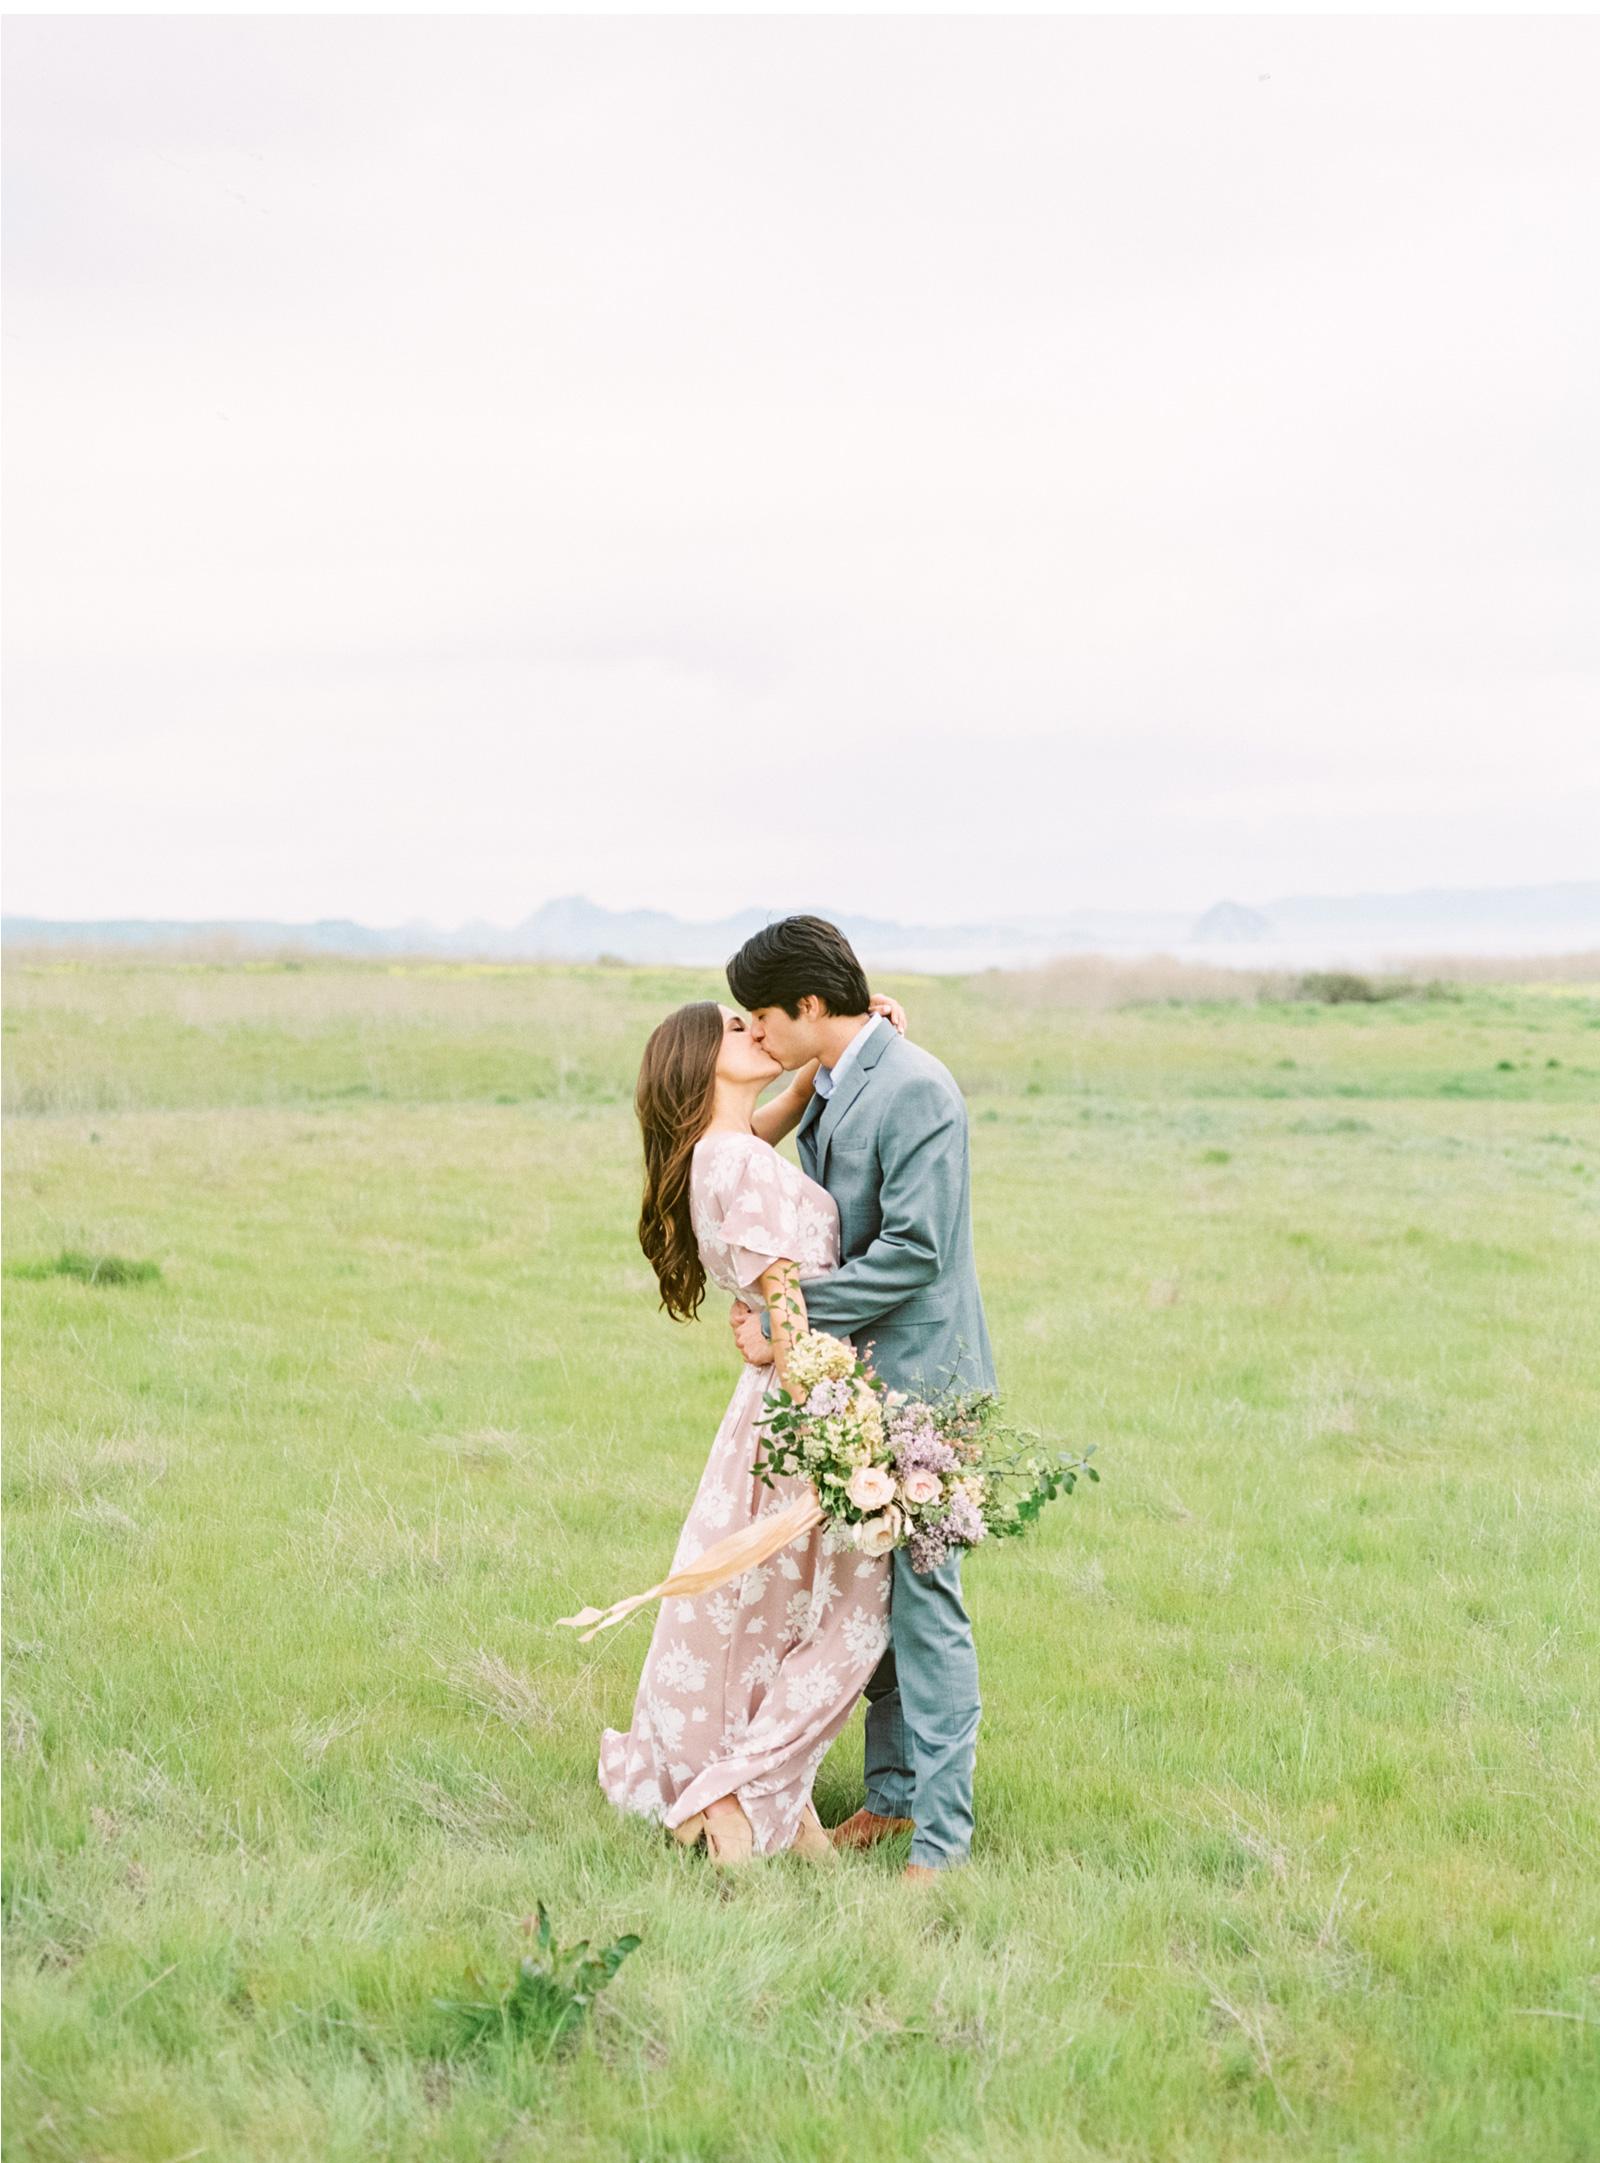 Saddlerock-Ranch-Malibu-Wedding-Natalie-Schutt-Photography-Romantic-Florals-Rolling-Hills-Engagement_16.jpg